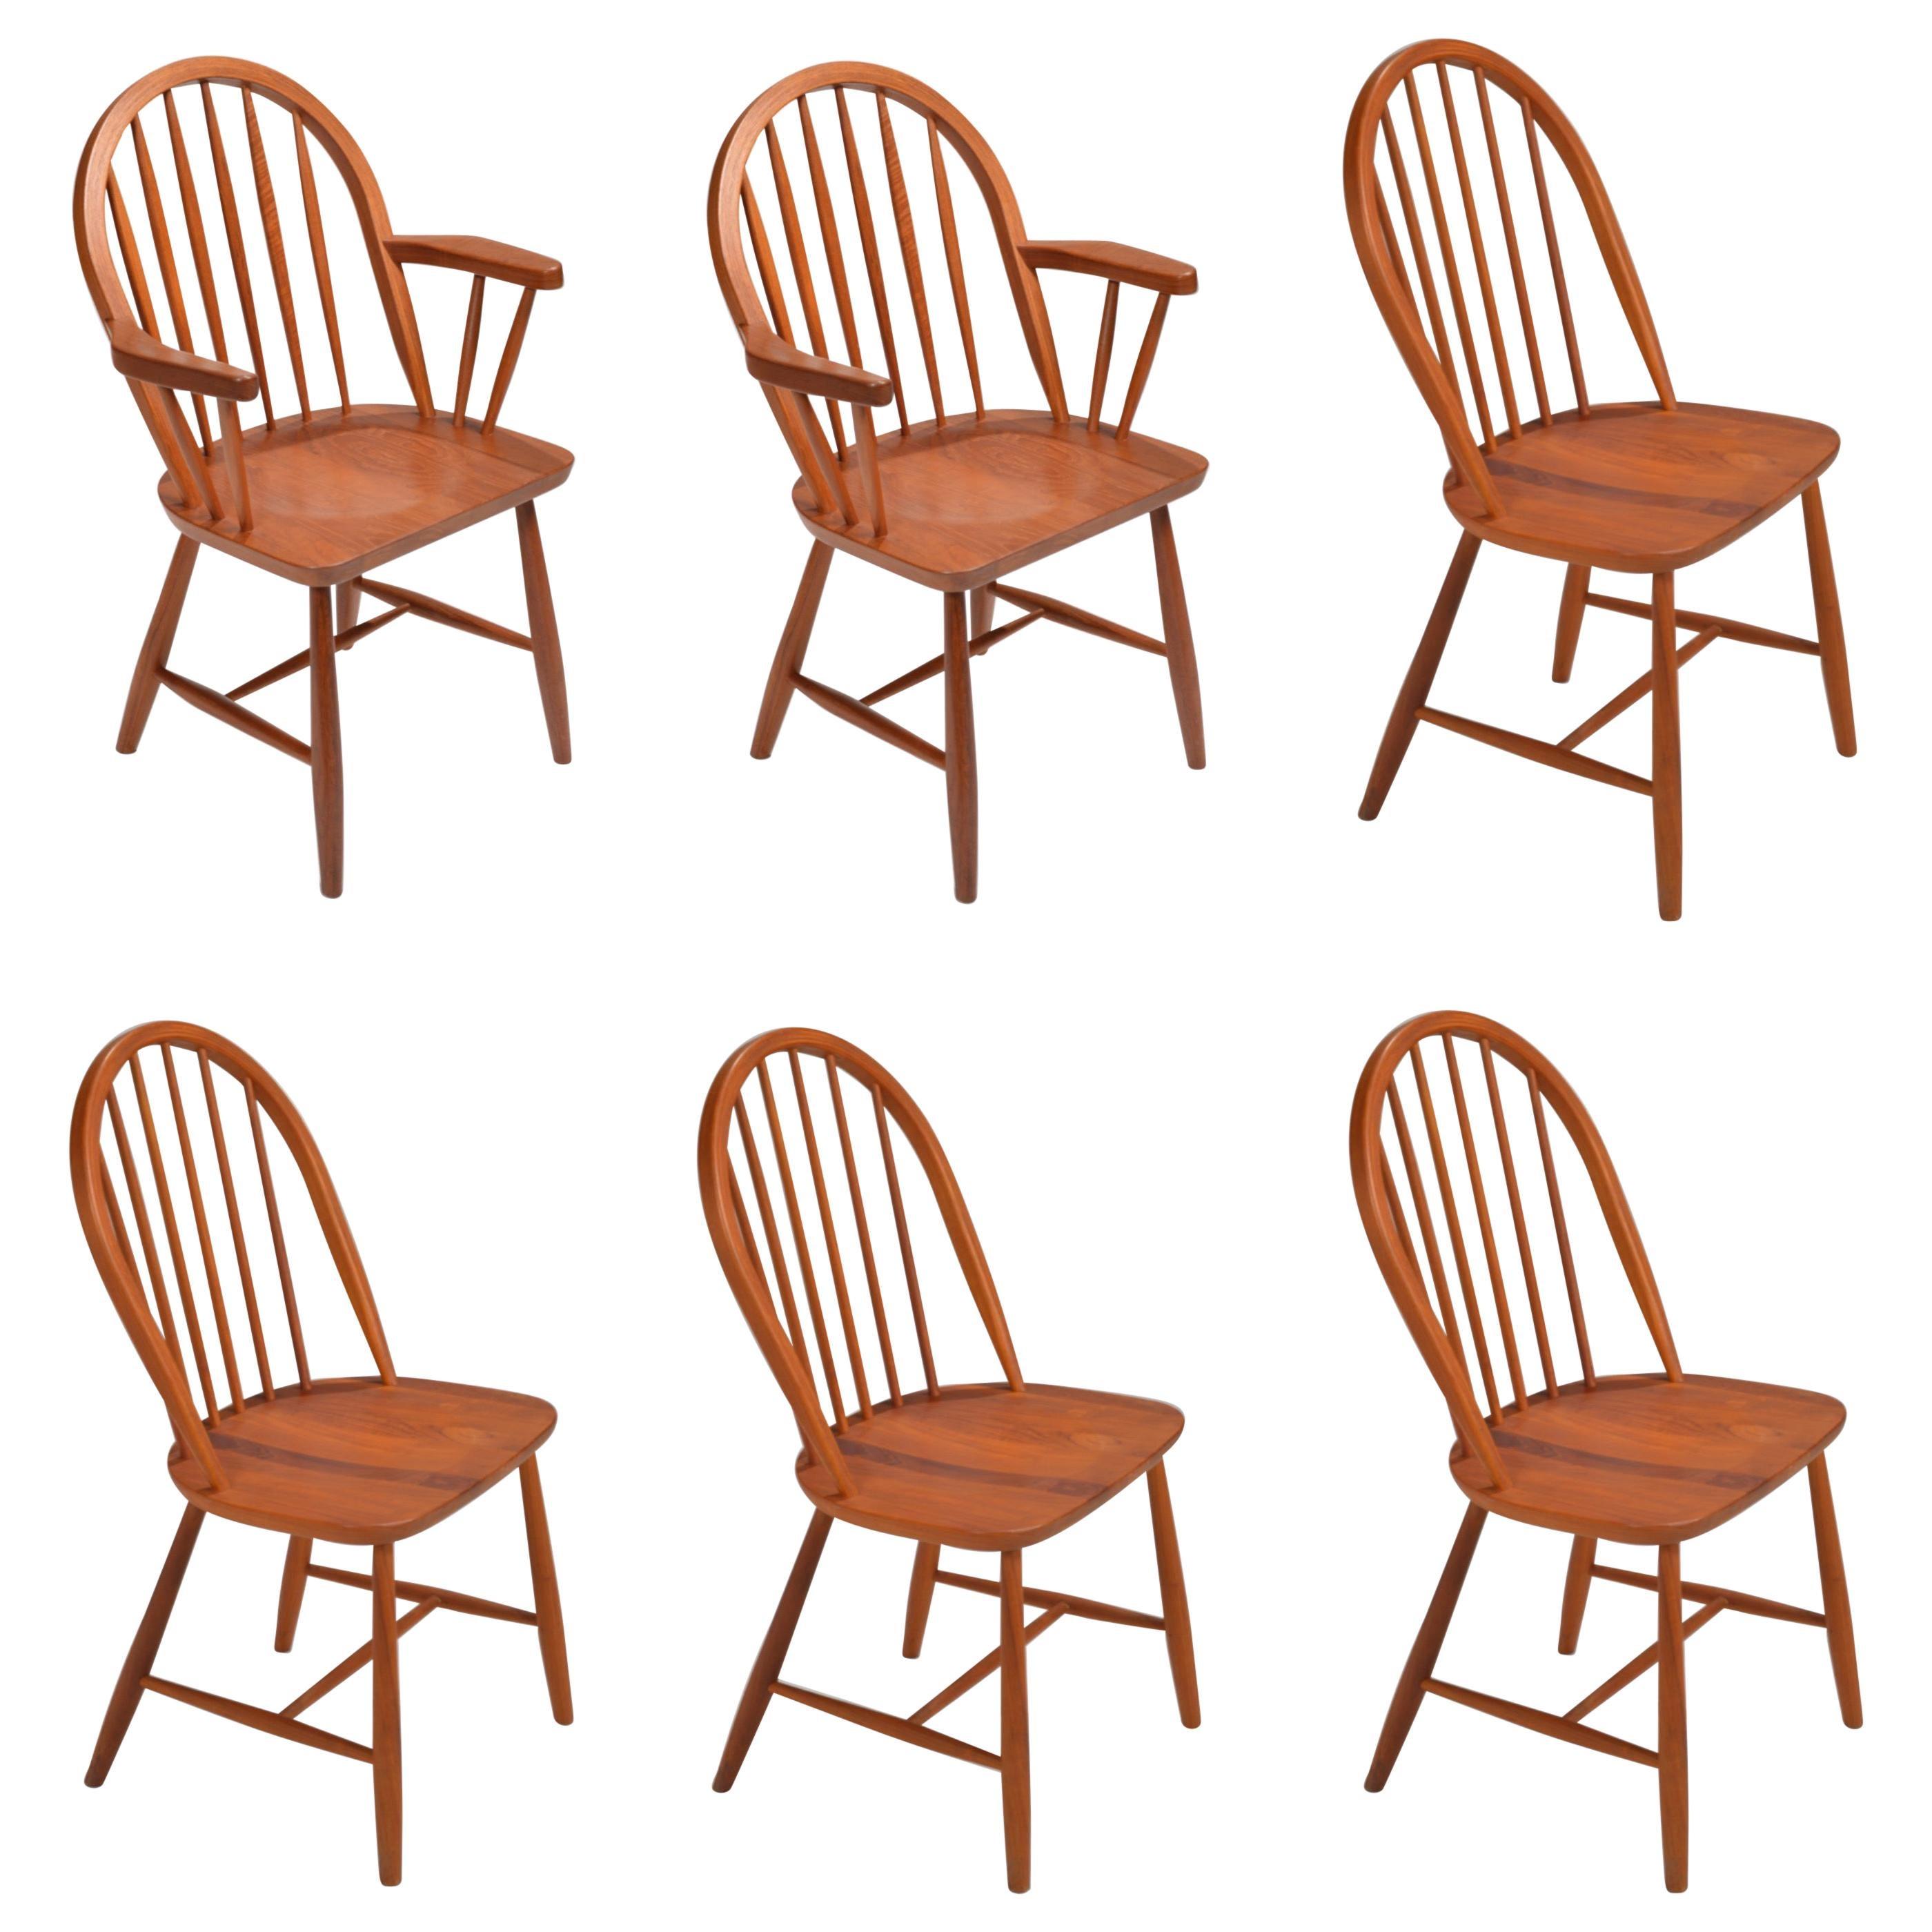 Danish Teak Dining Chairs by Erik Ole Jørgensen for Tarm Stole